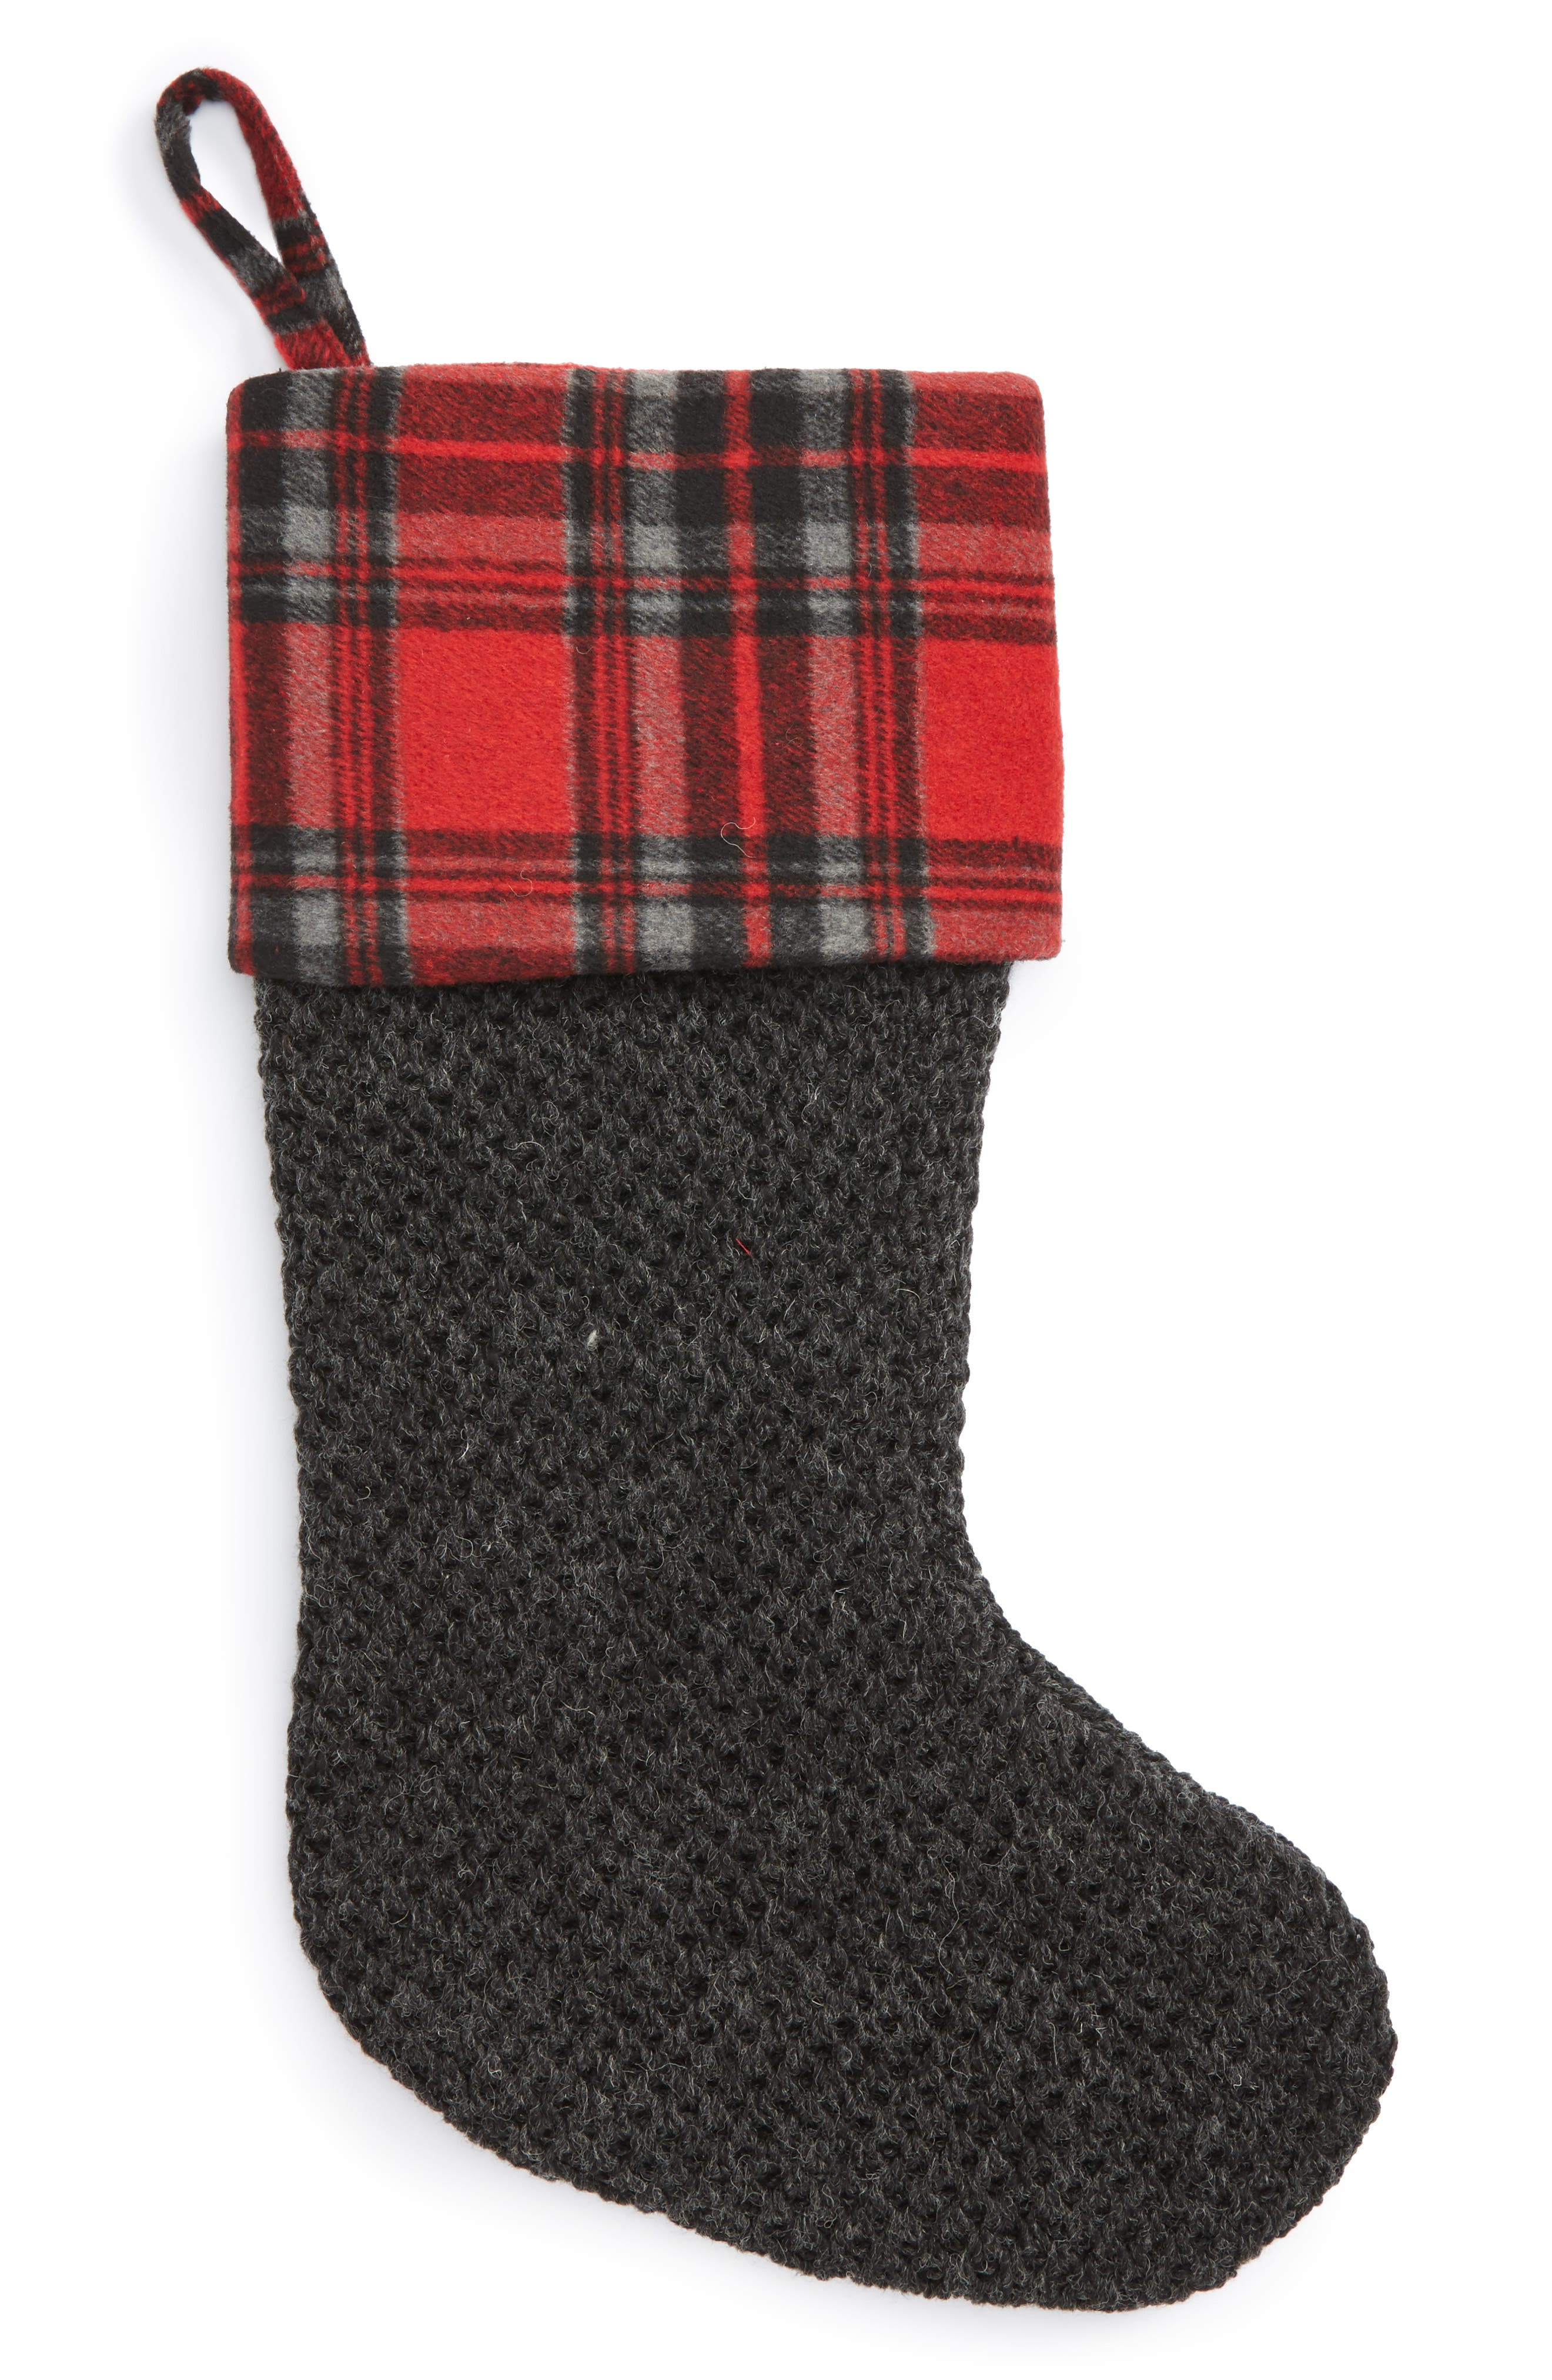 ALLSTATE Knit Stocking